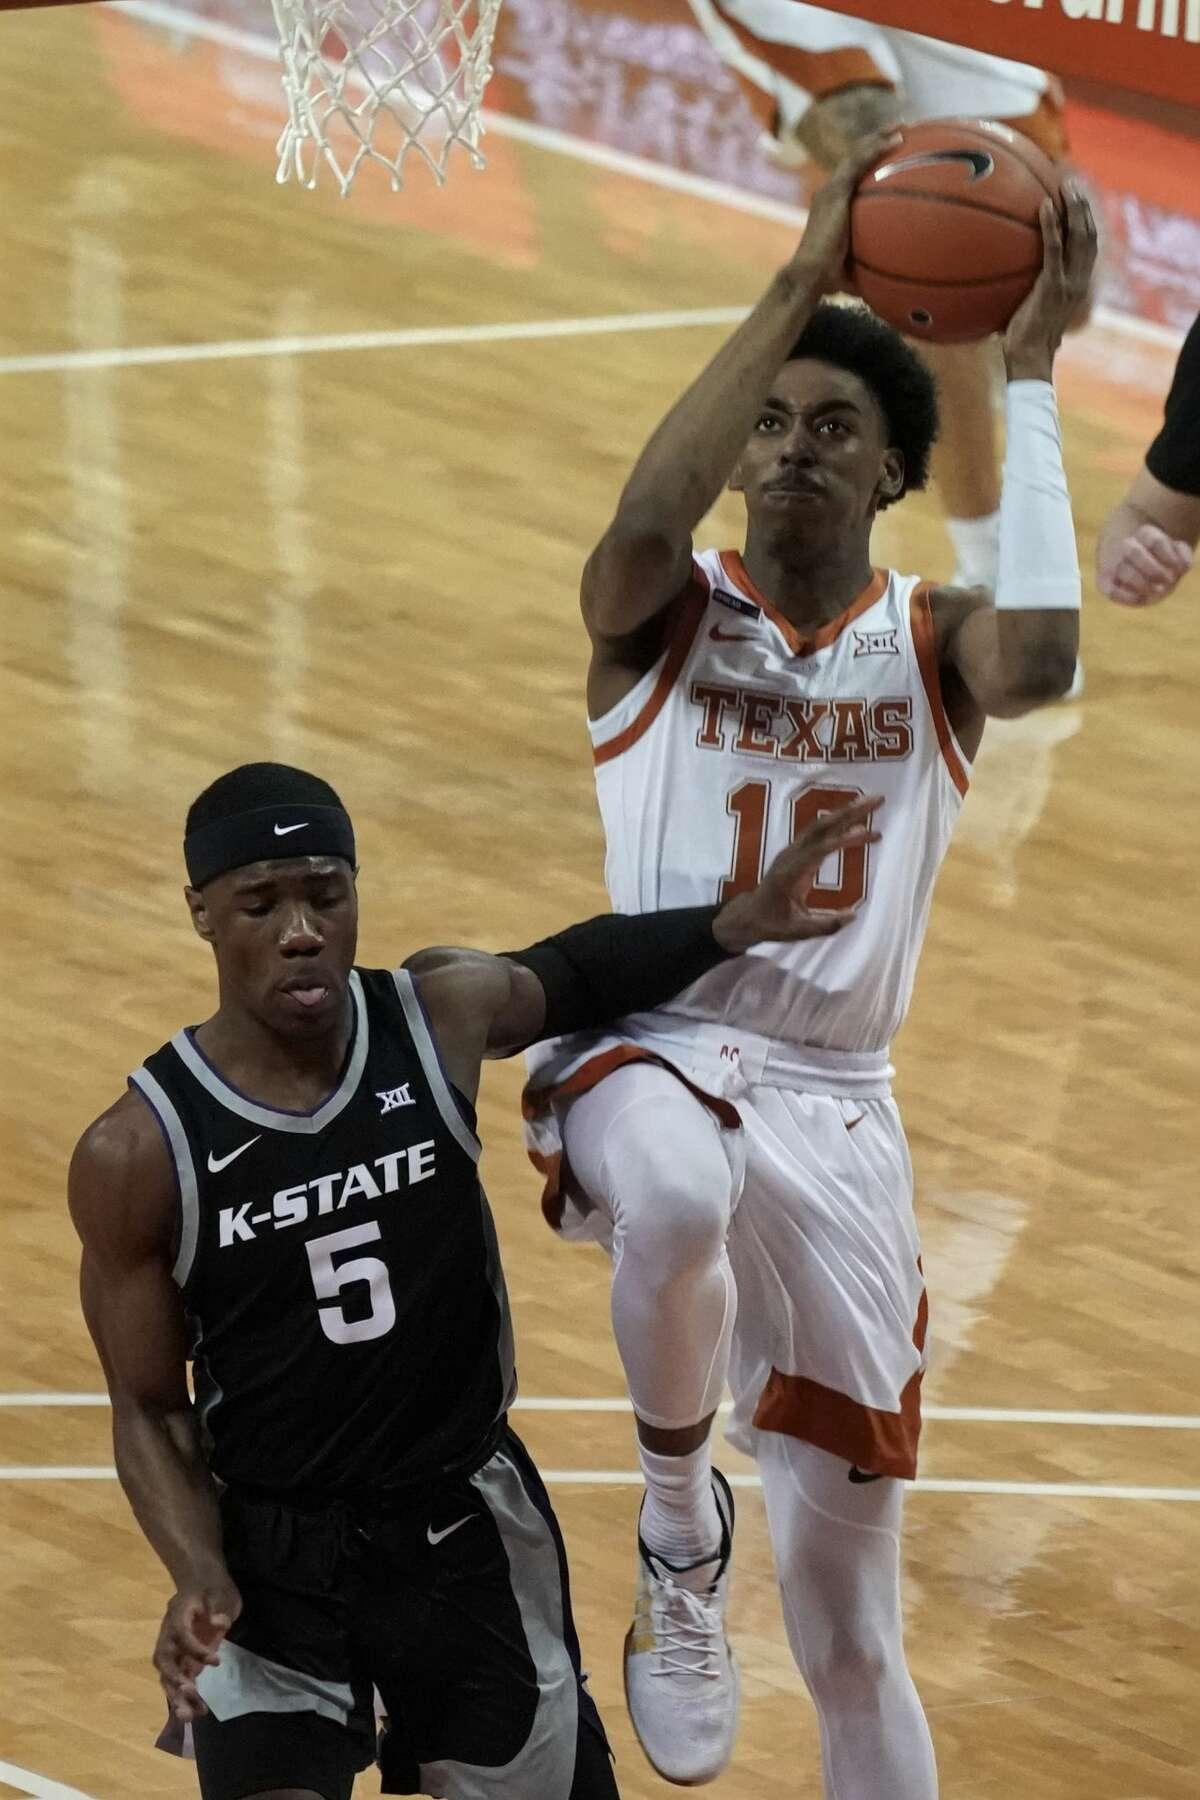 Texas' Donovan Williams (10) drives against Kansas State's Rudi Williams (5) during the first half of an NCAA college basketball game in Austin, Texas, Saturday, Jan. 16, 2021. (AP Photo/Chuck Burton)